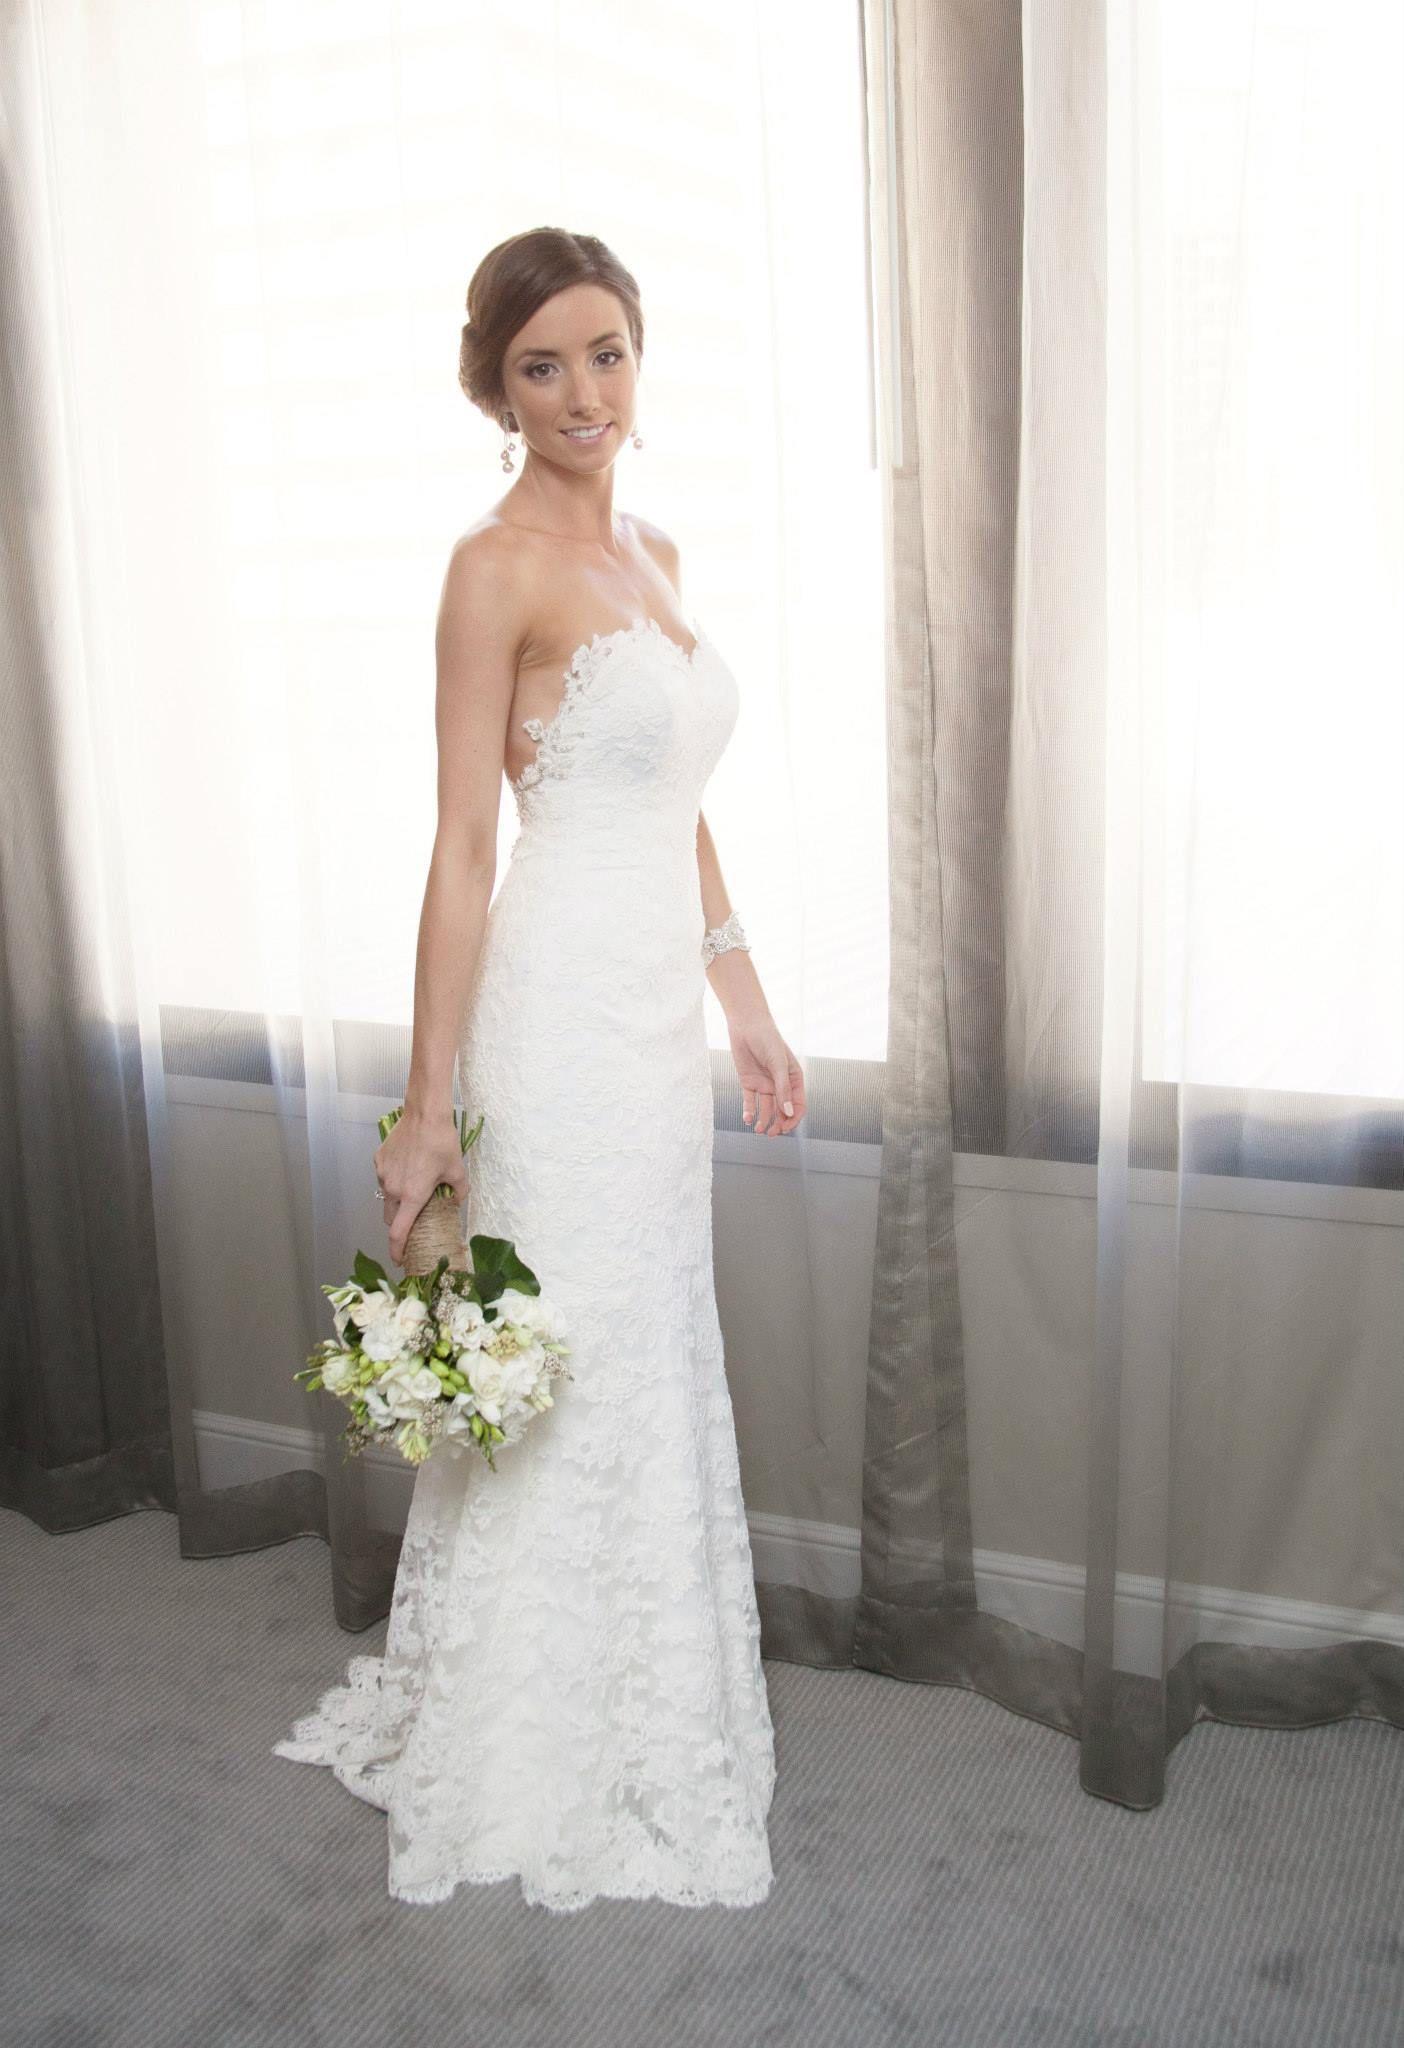 Sharna in her two-piece custom made Ella Moda wedding gown